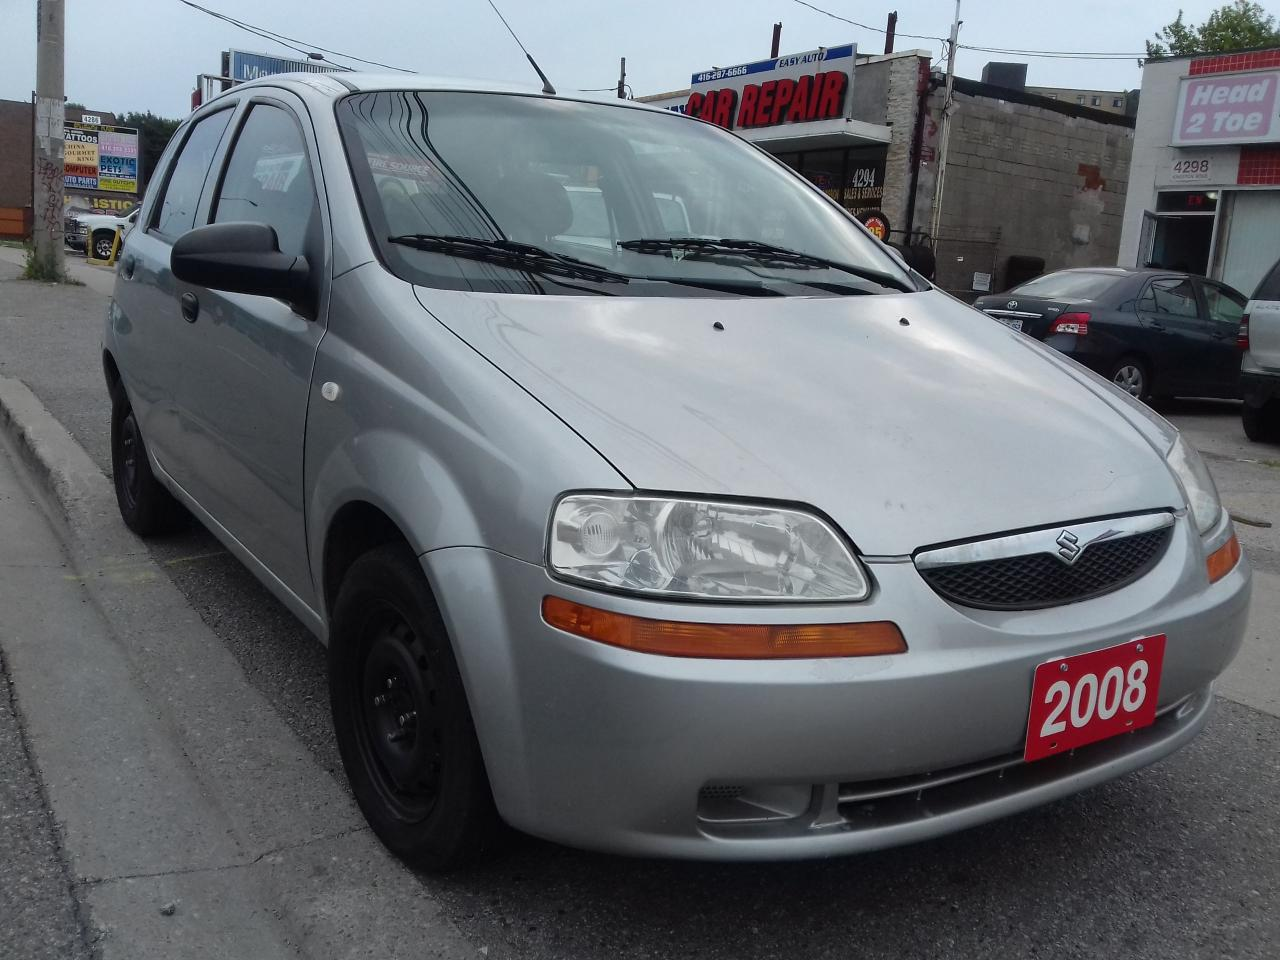 2008 Suzuki Swift $2995 CERTIFIED / GAS SAVER  / 1.6 LT / 161,000 KM